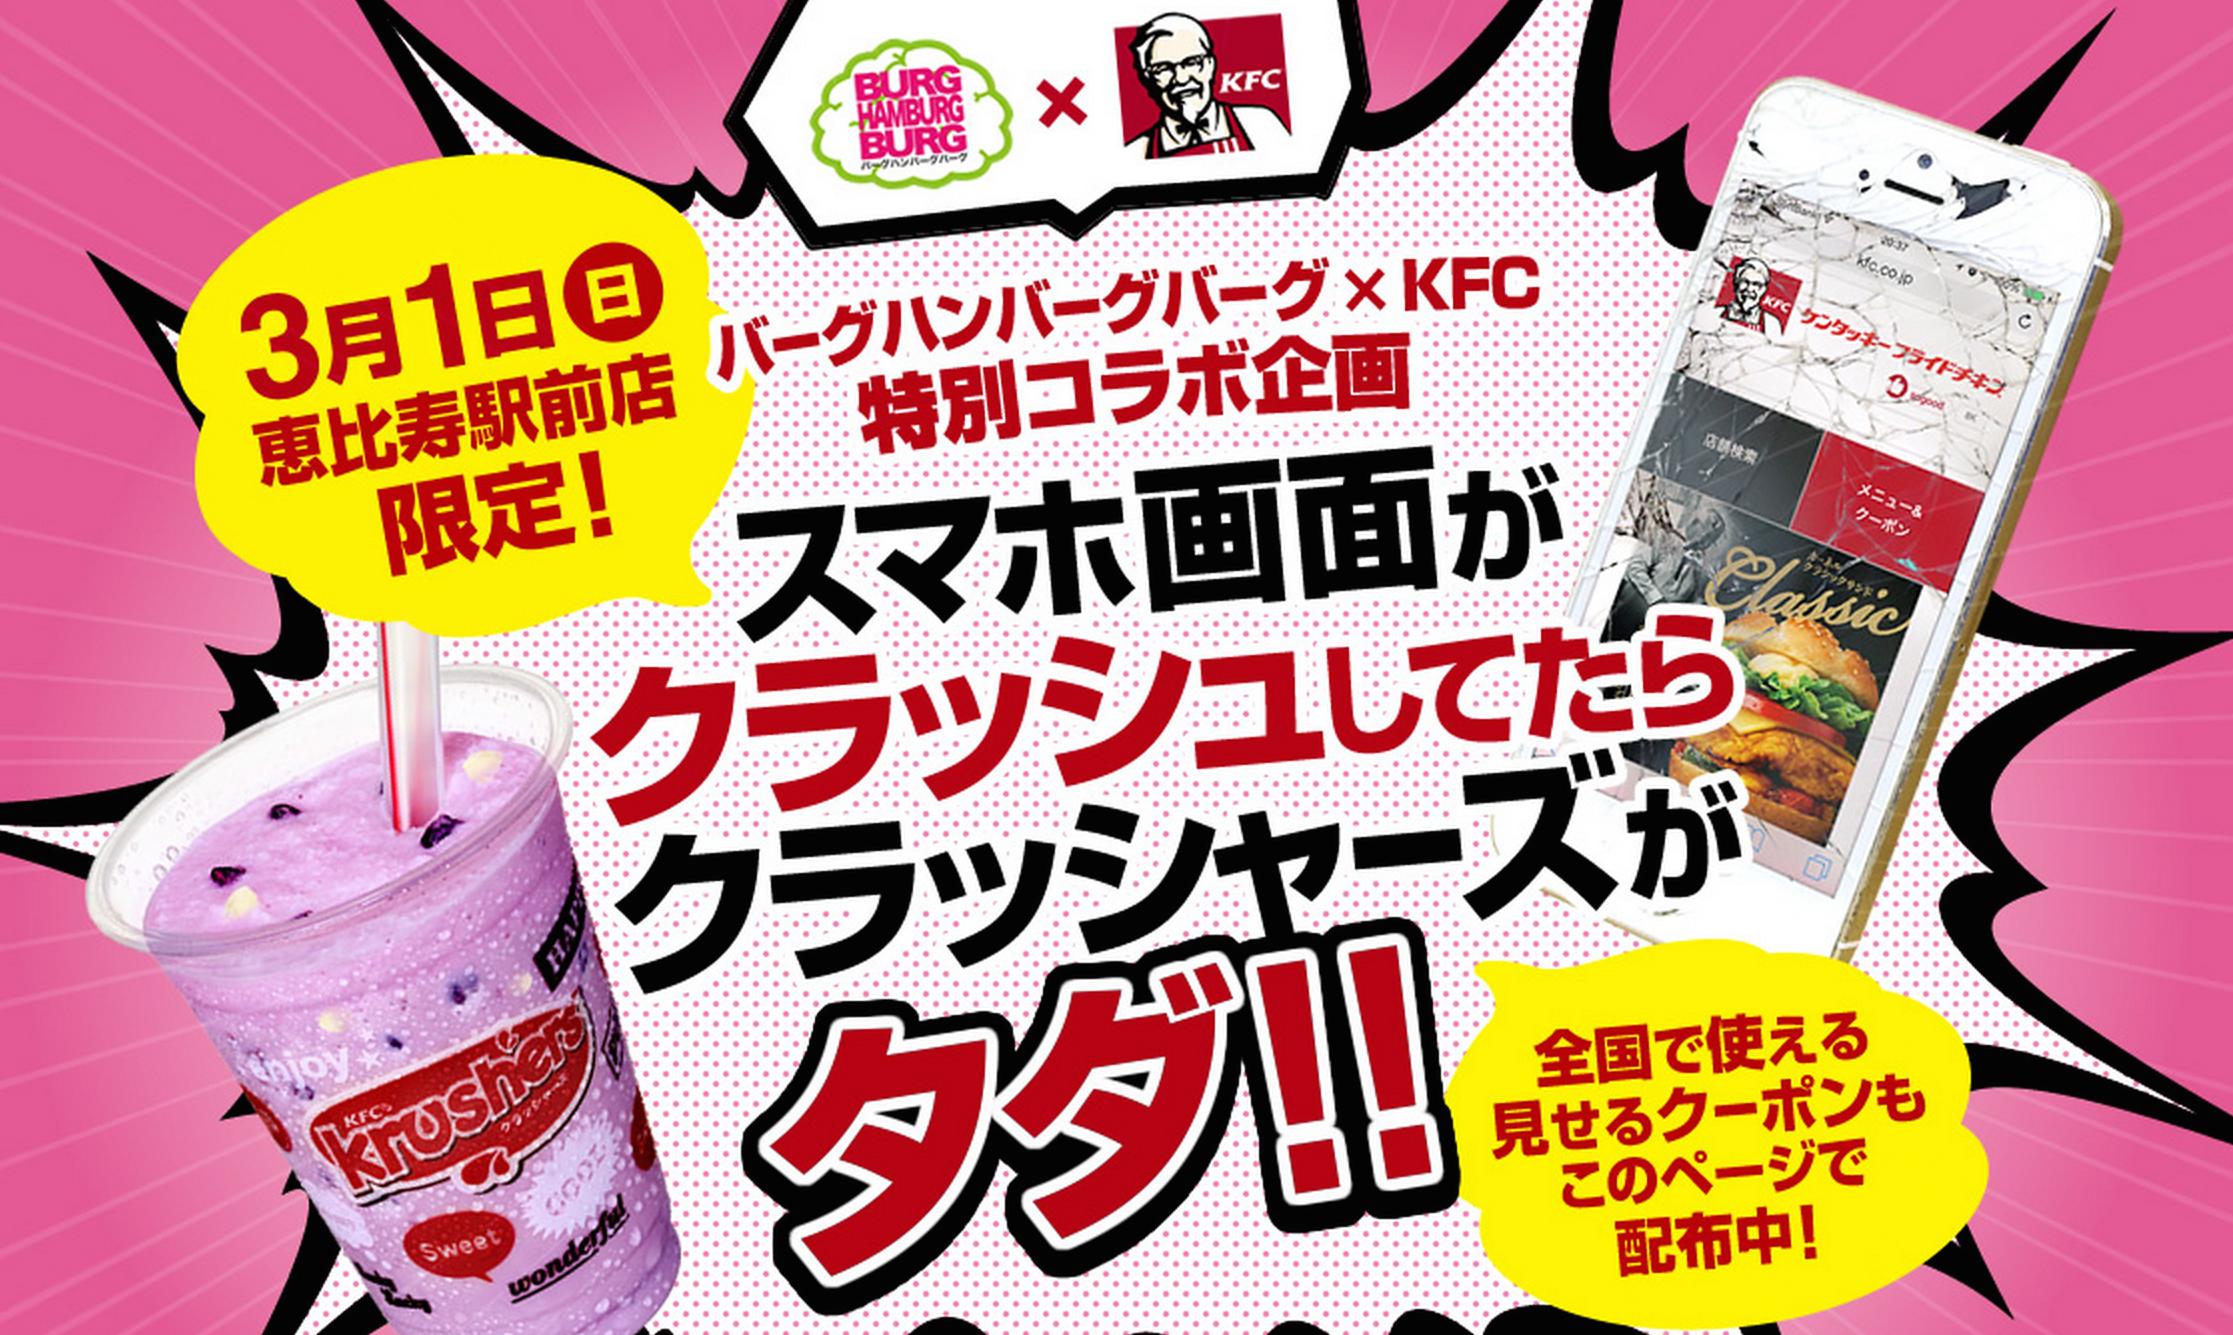 kfc ebisu krusher-smashed phone screen free drink